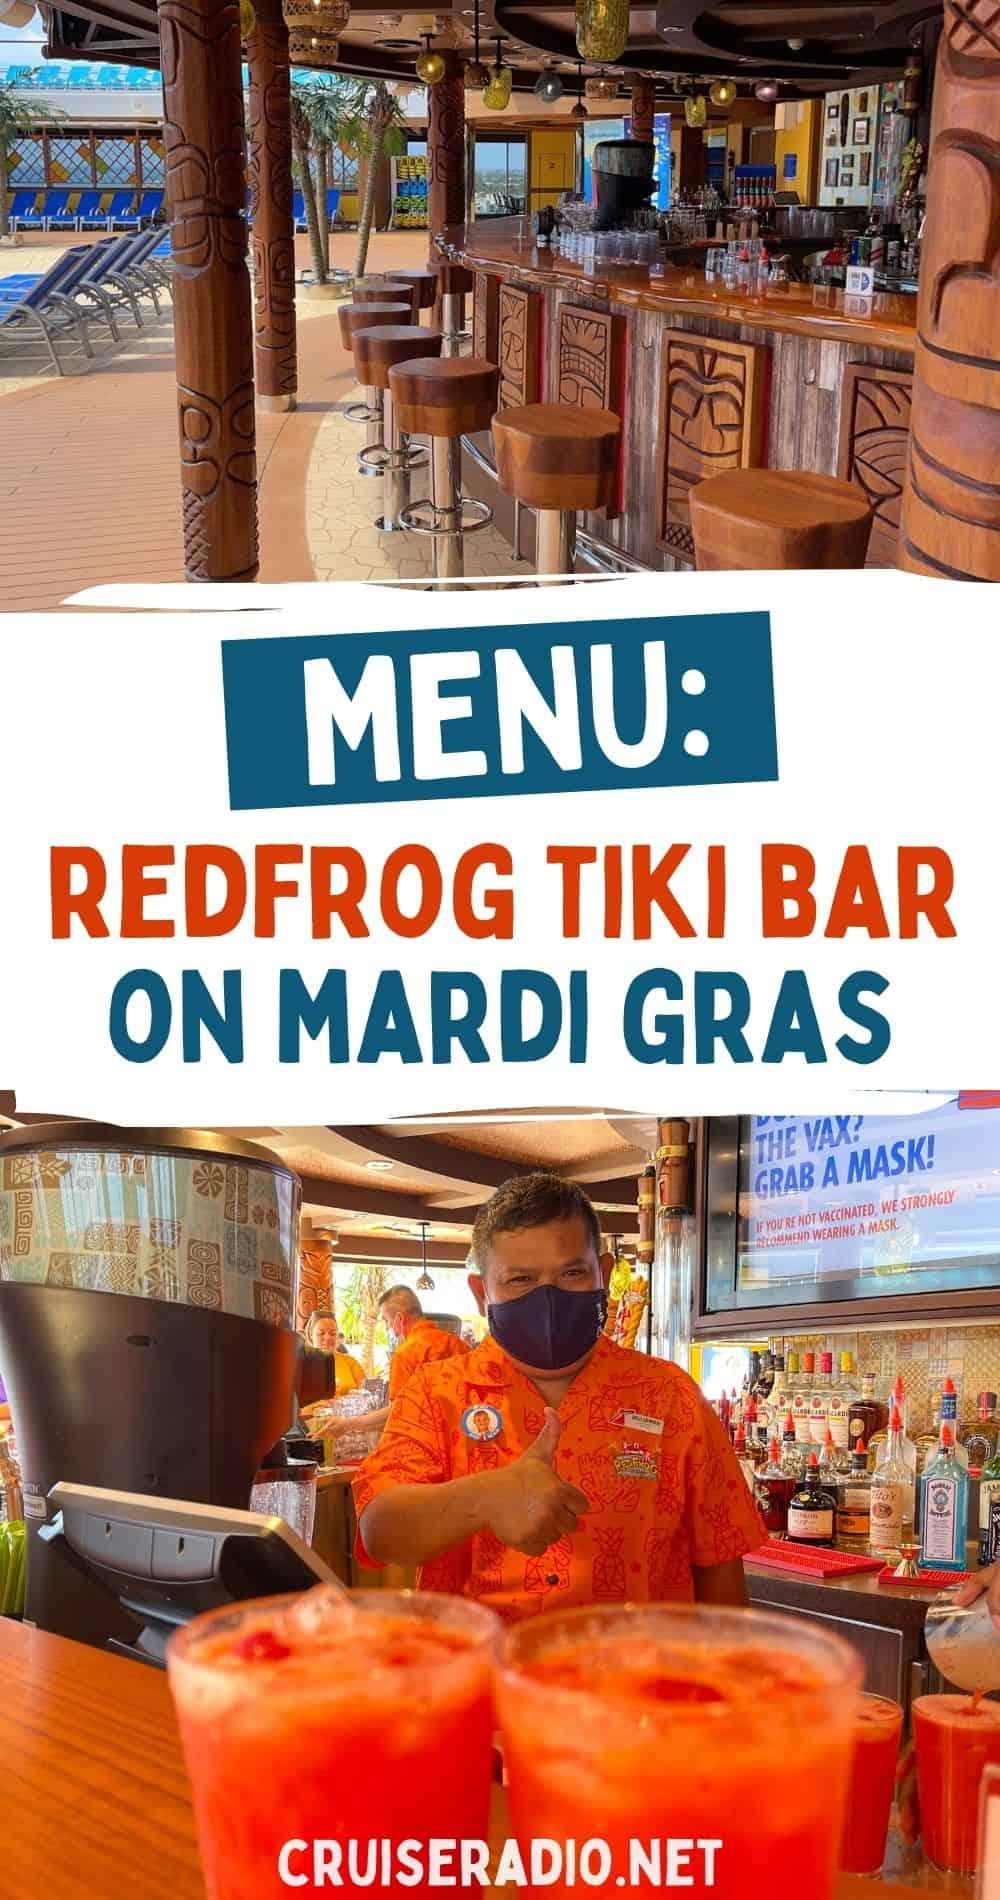 RedFrog tiki bar menu mardi gras